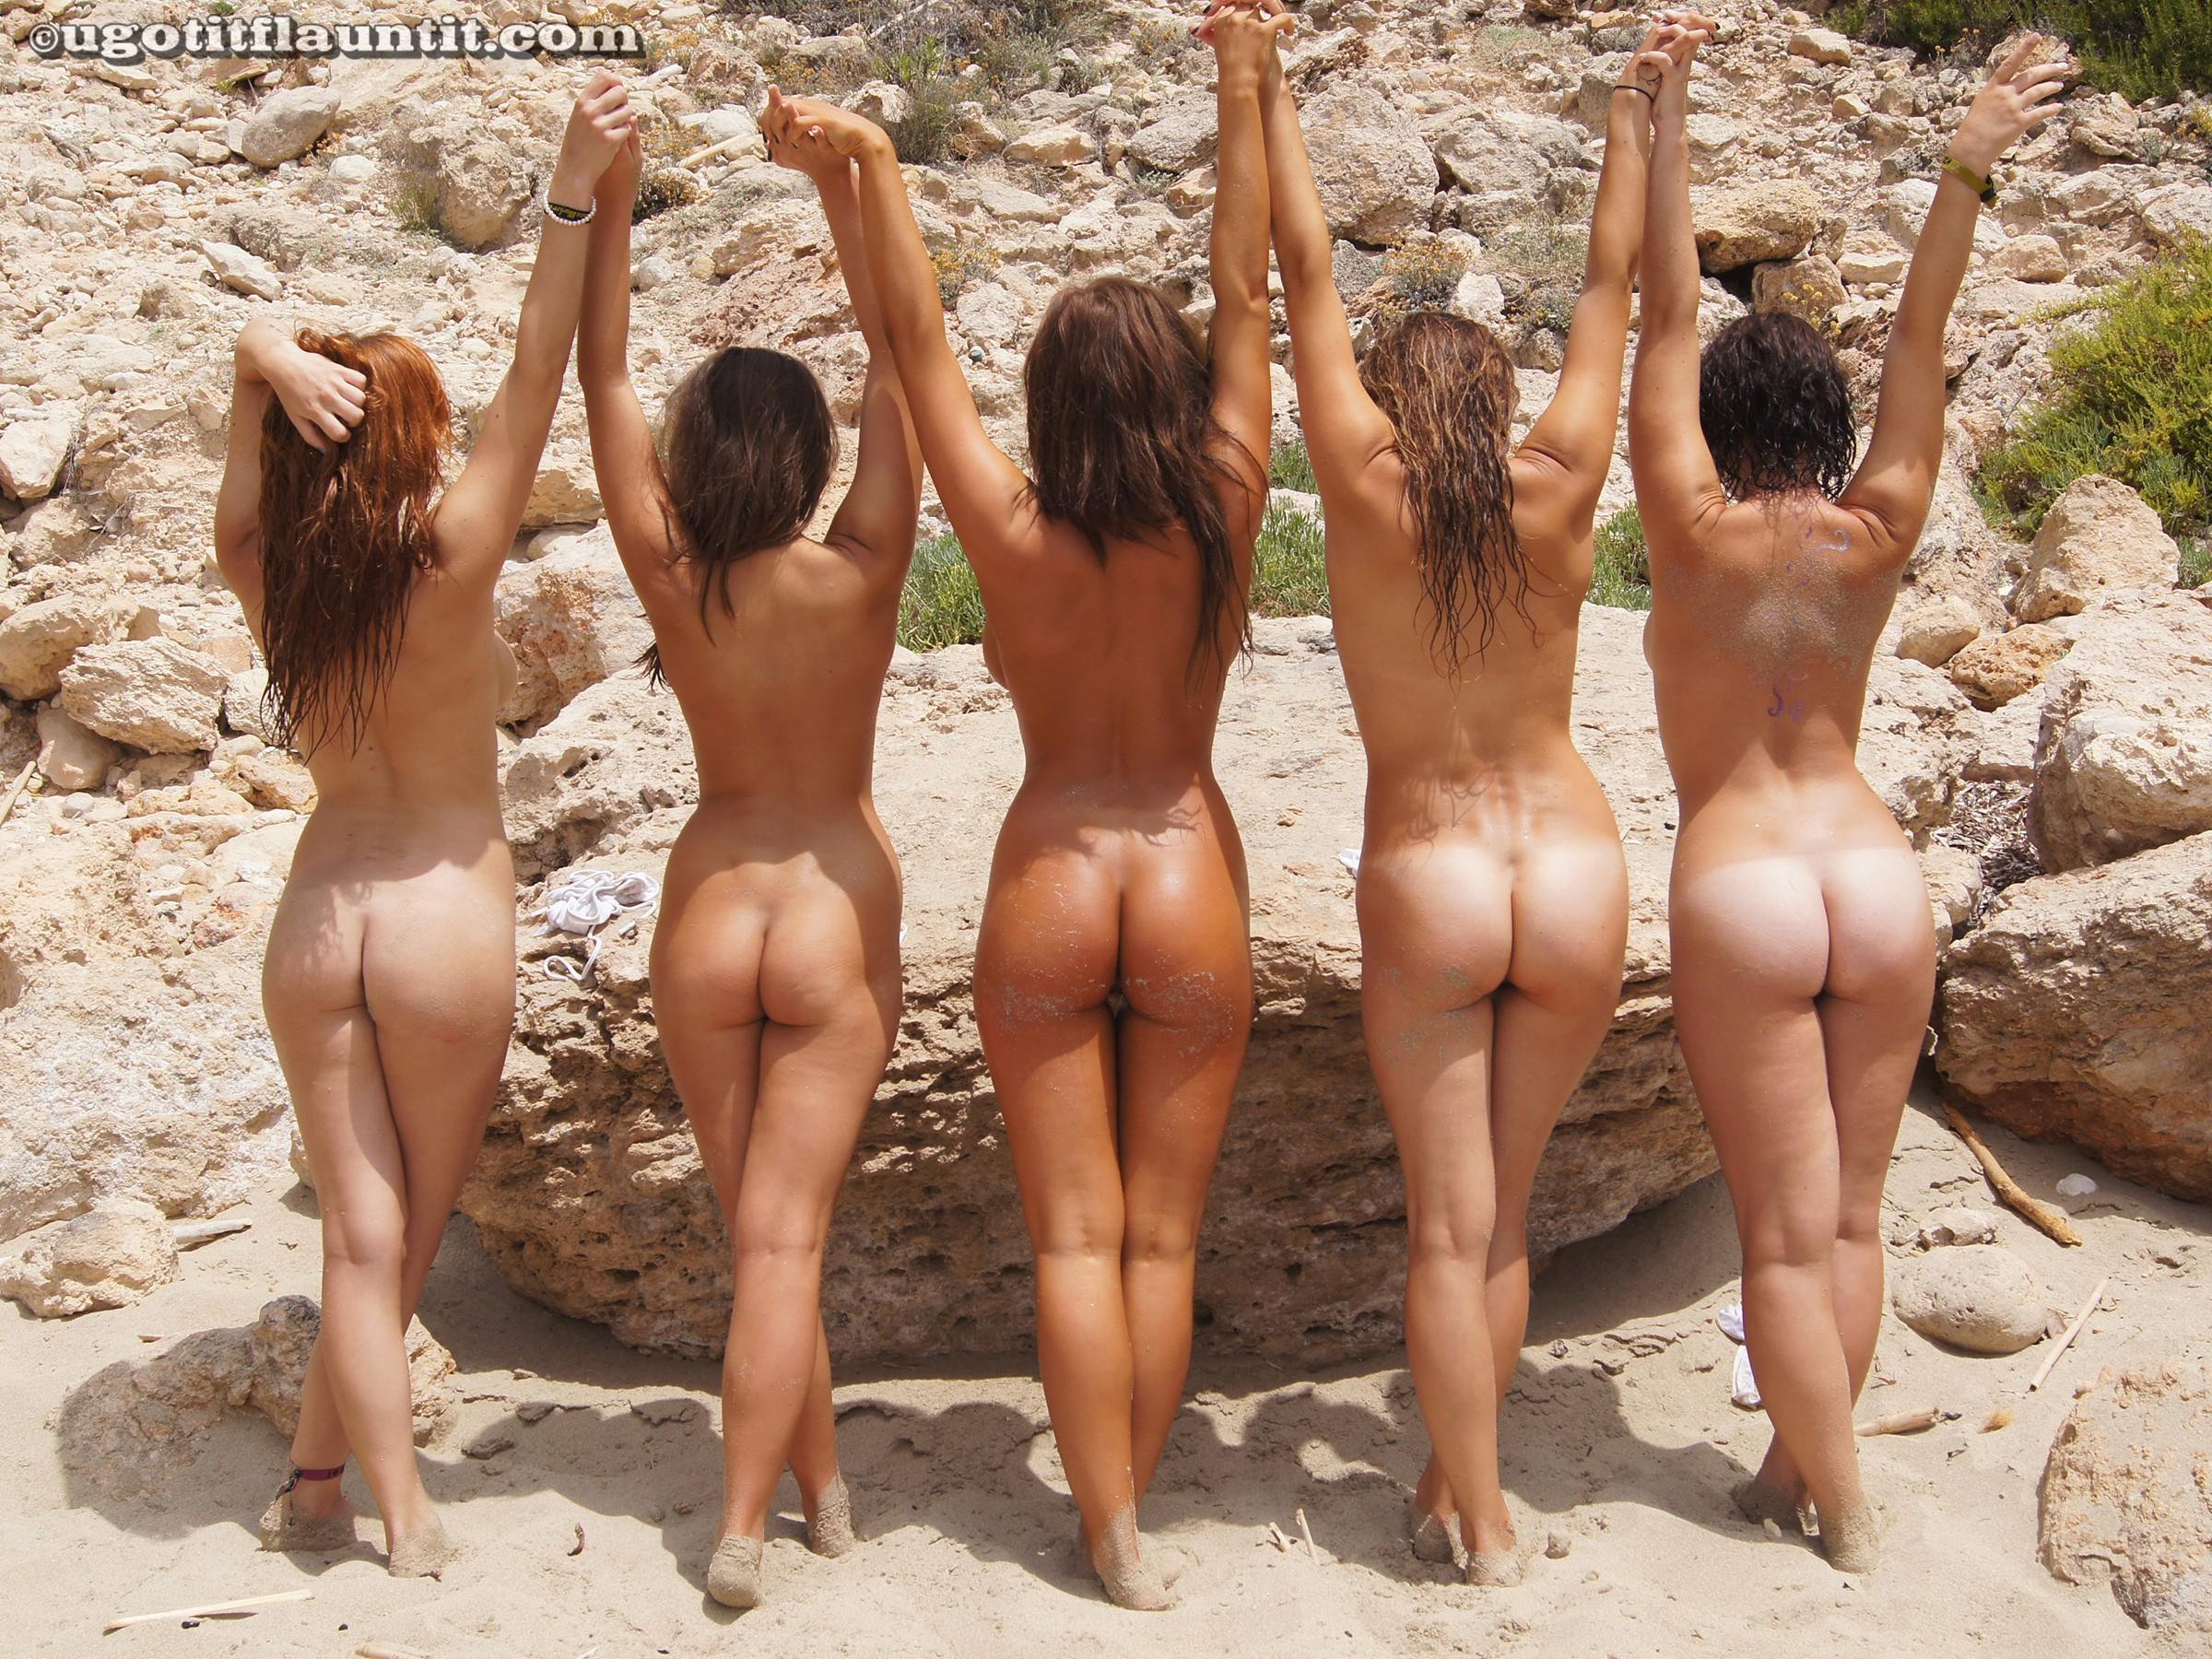 Blonde yanks lesbians miss trish and starlette - 1 part 1